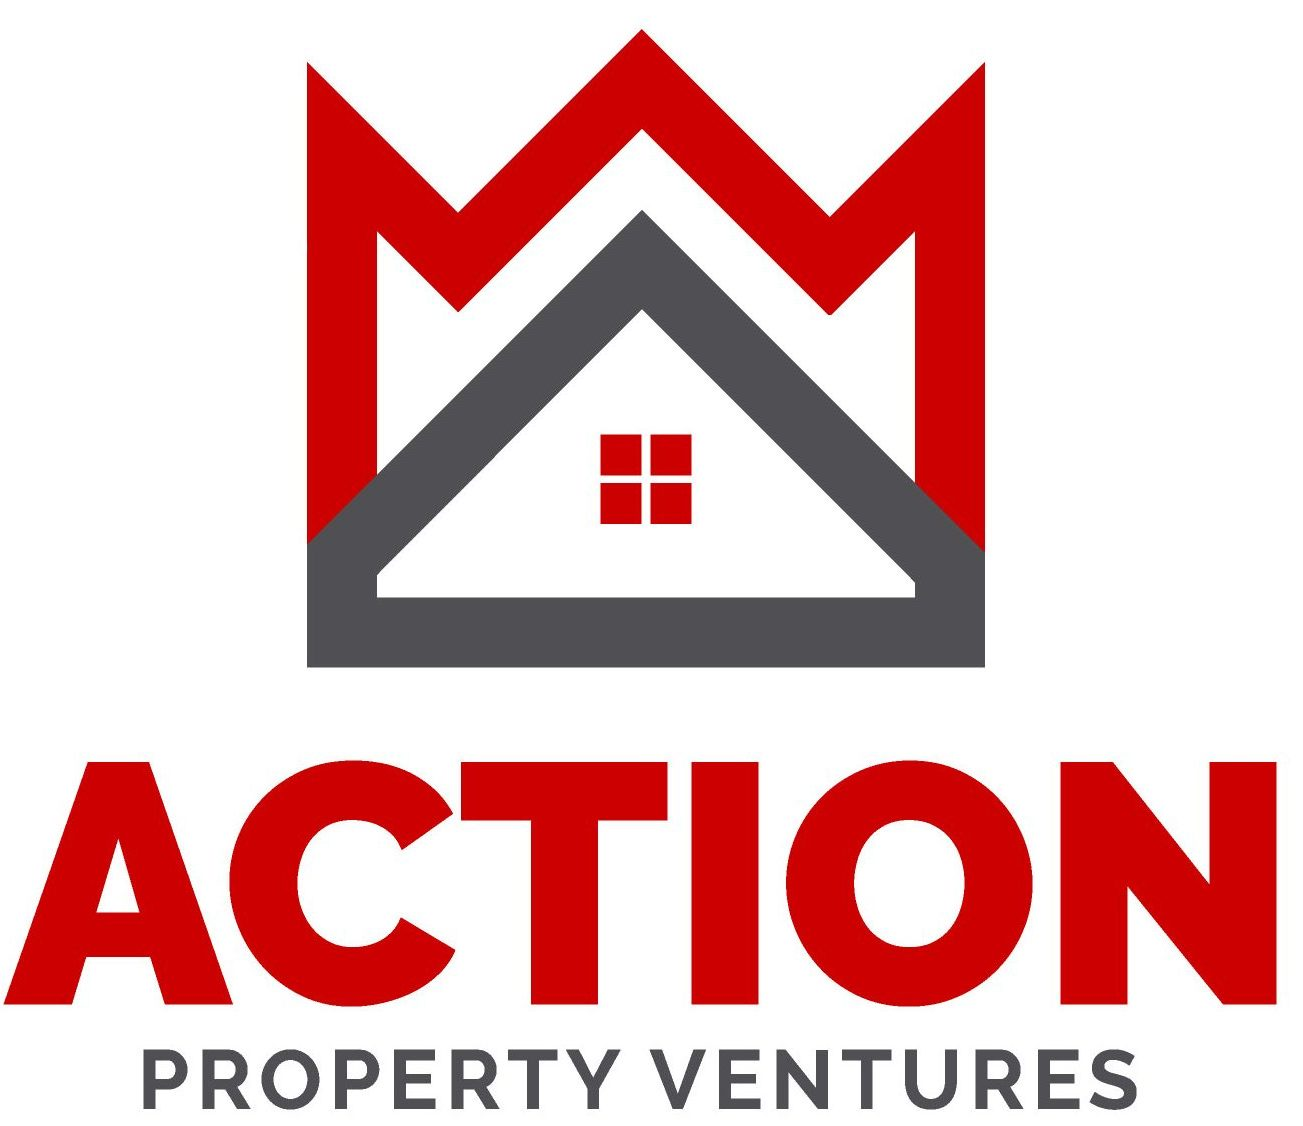 Action Property Ventures